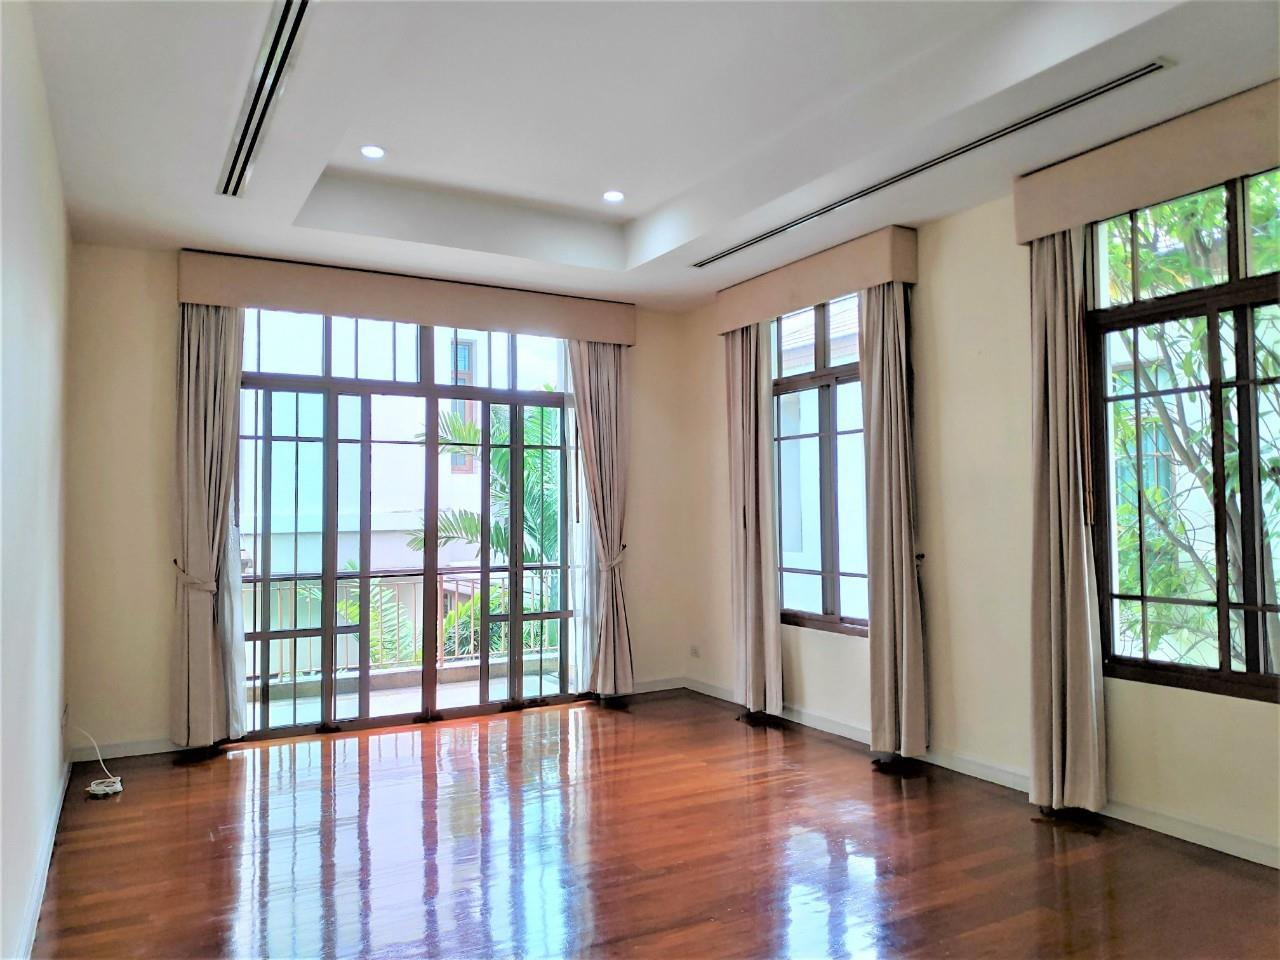 Agent - Natchga Boonkrong  Agency's For Rent House 4 Bedrooms Baan Sansiri Sukhumvit 67 28